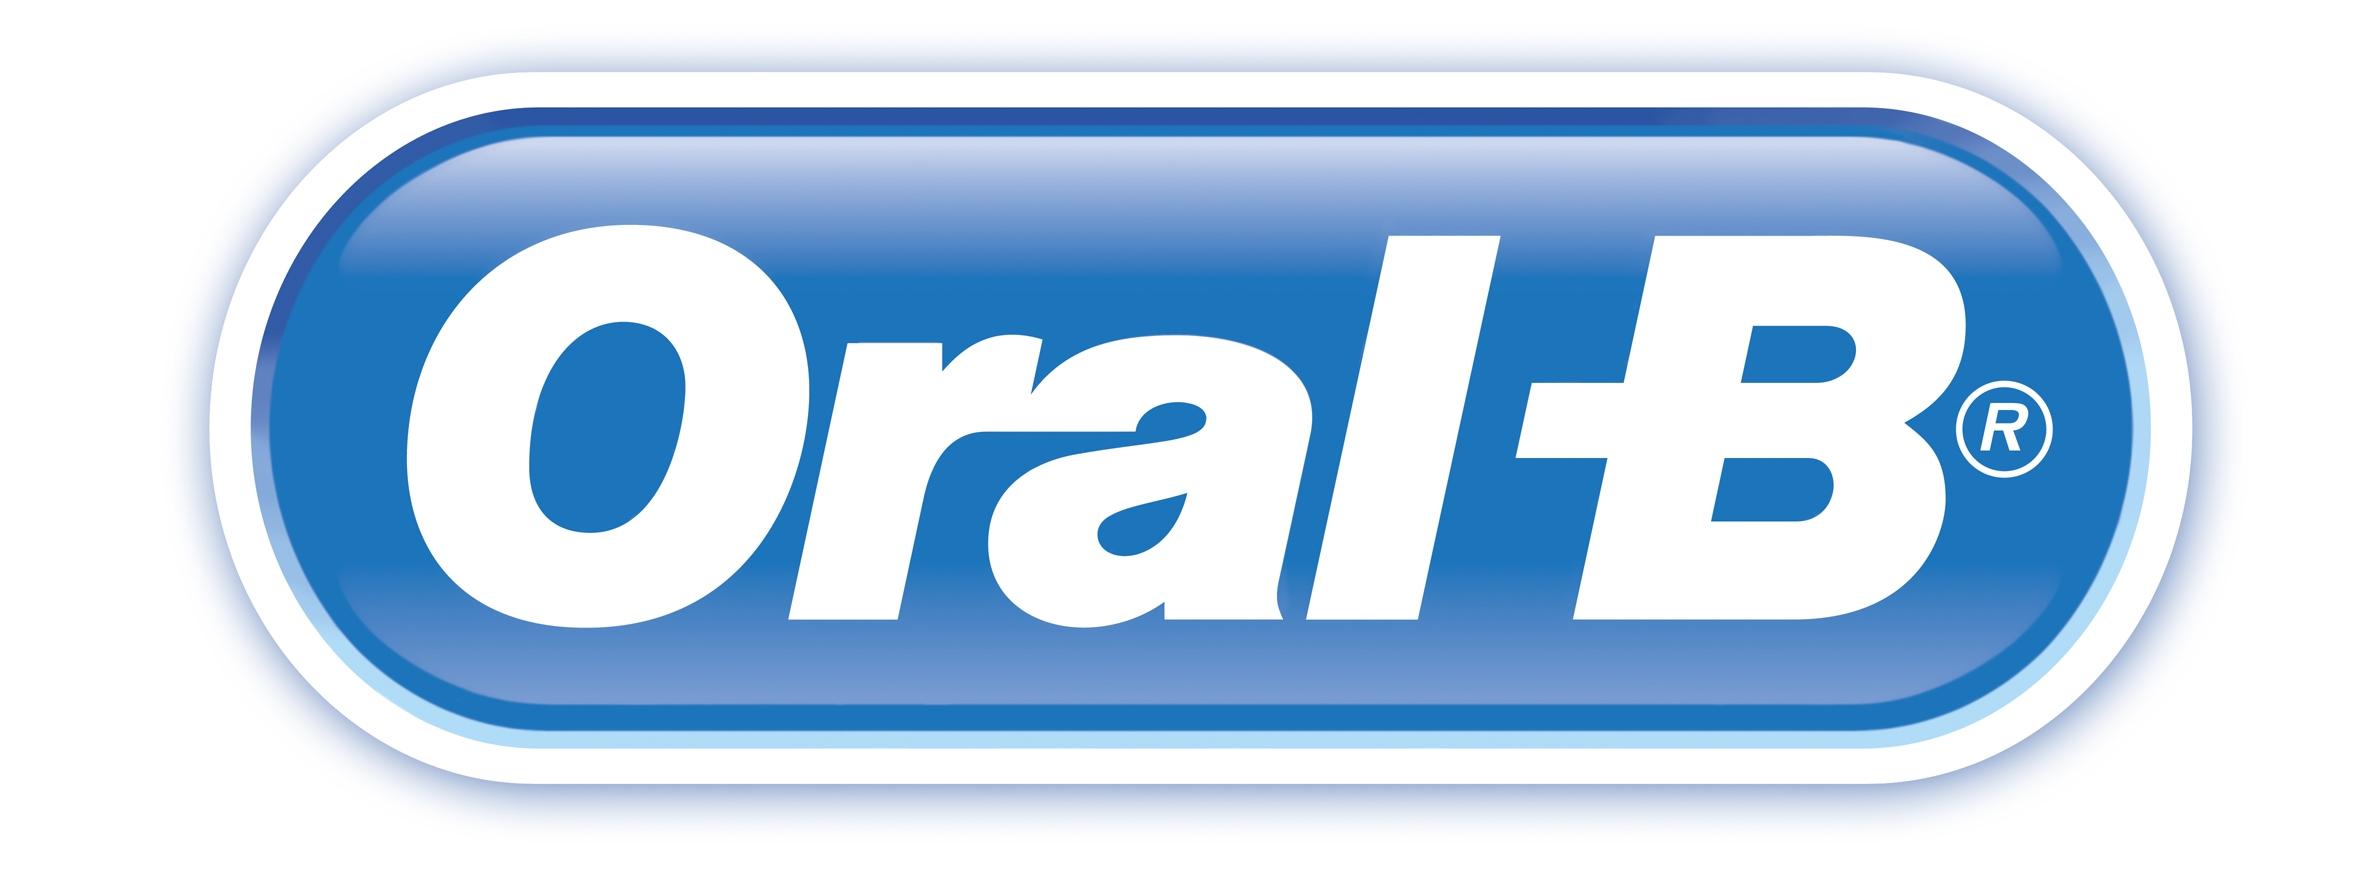 Зубные щетки Oral-B